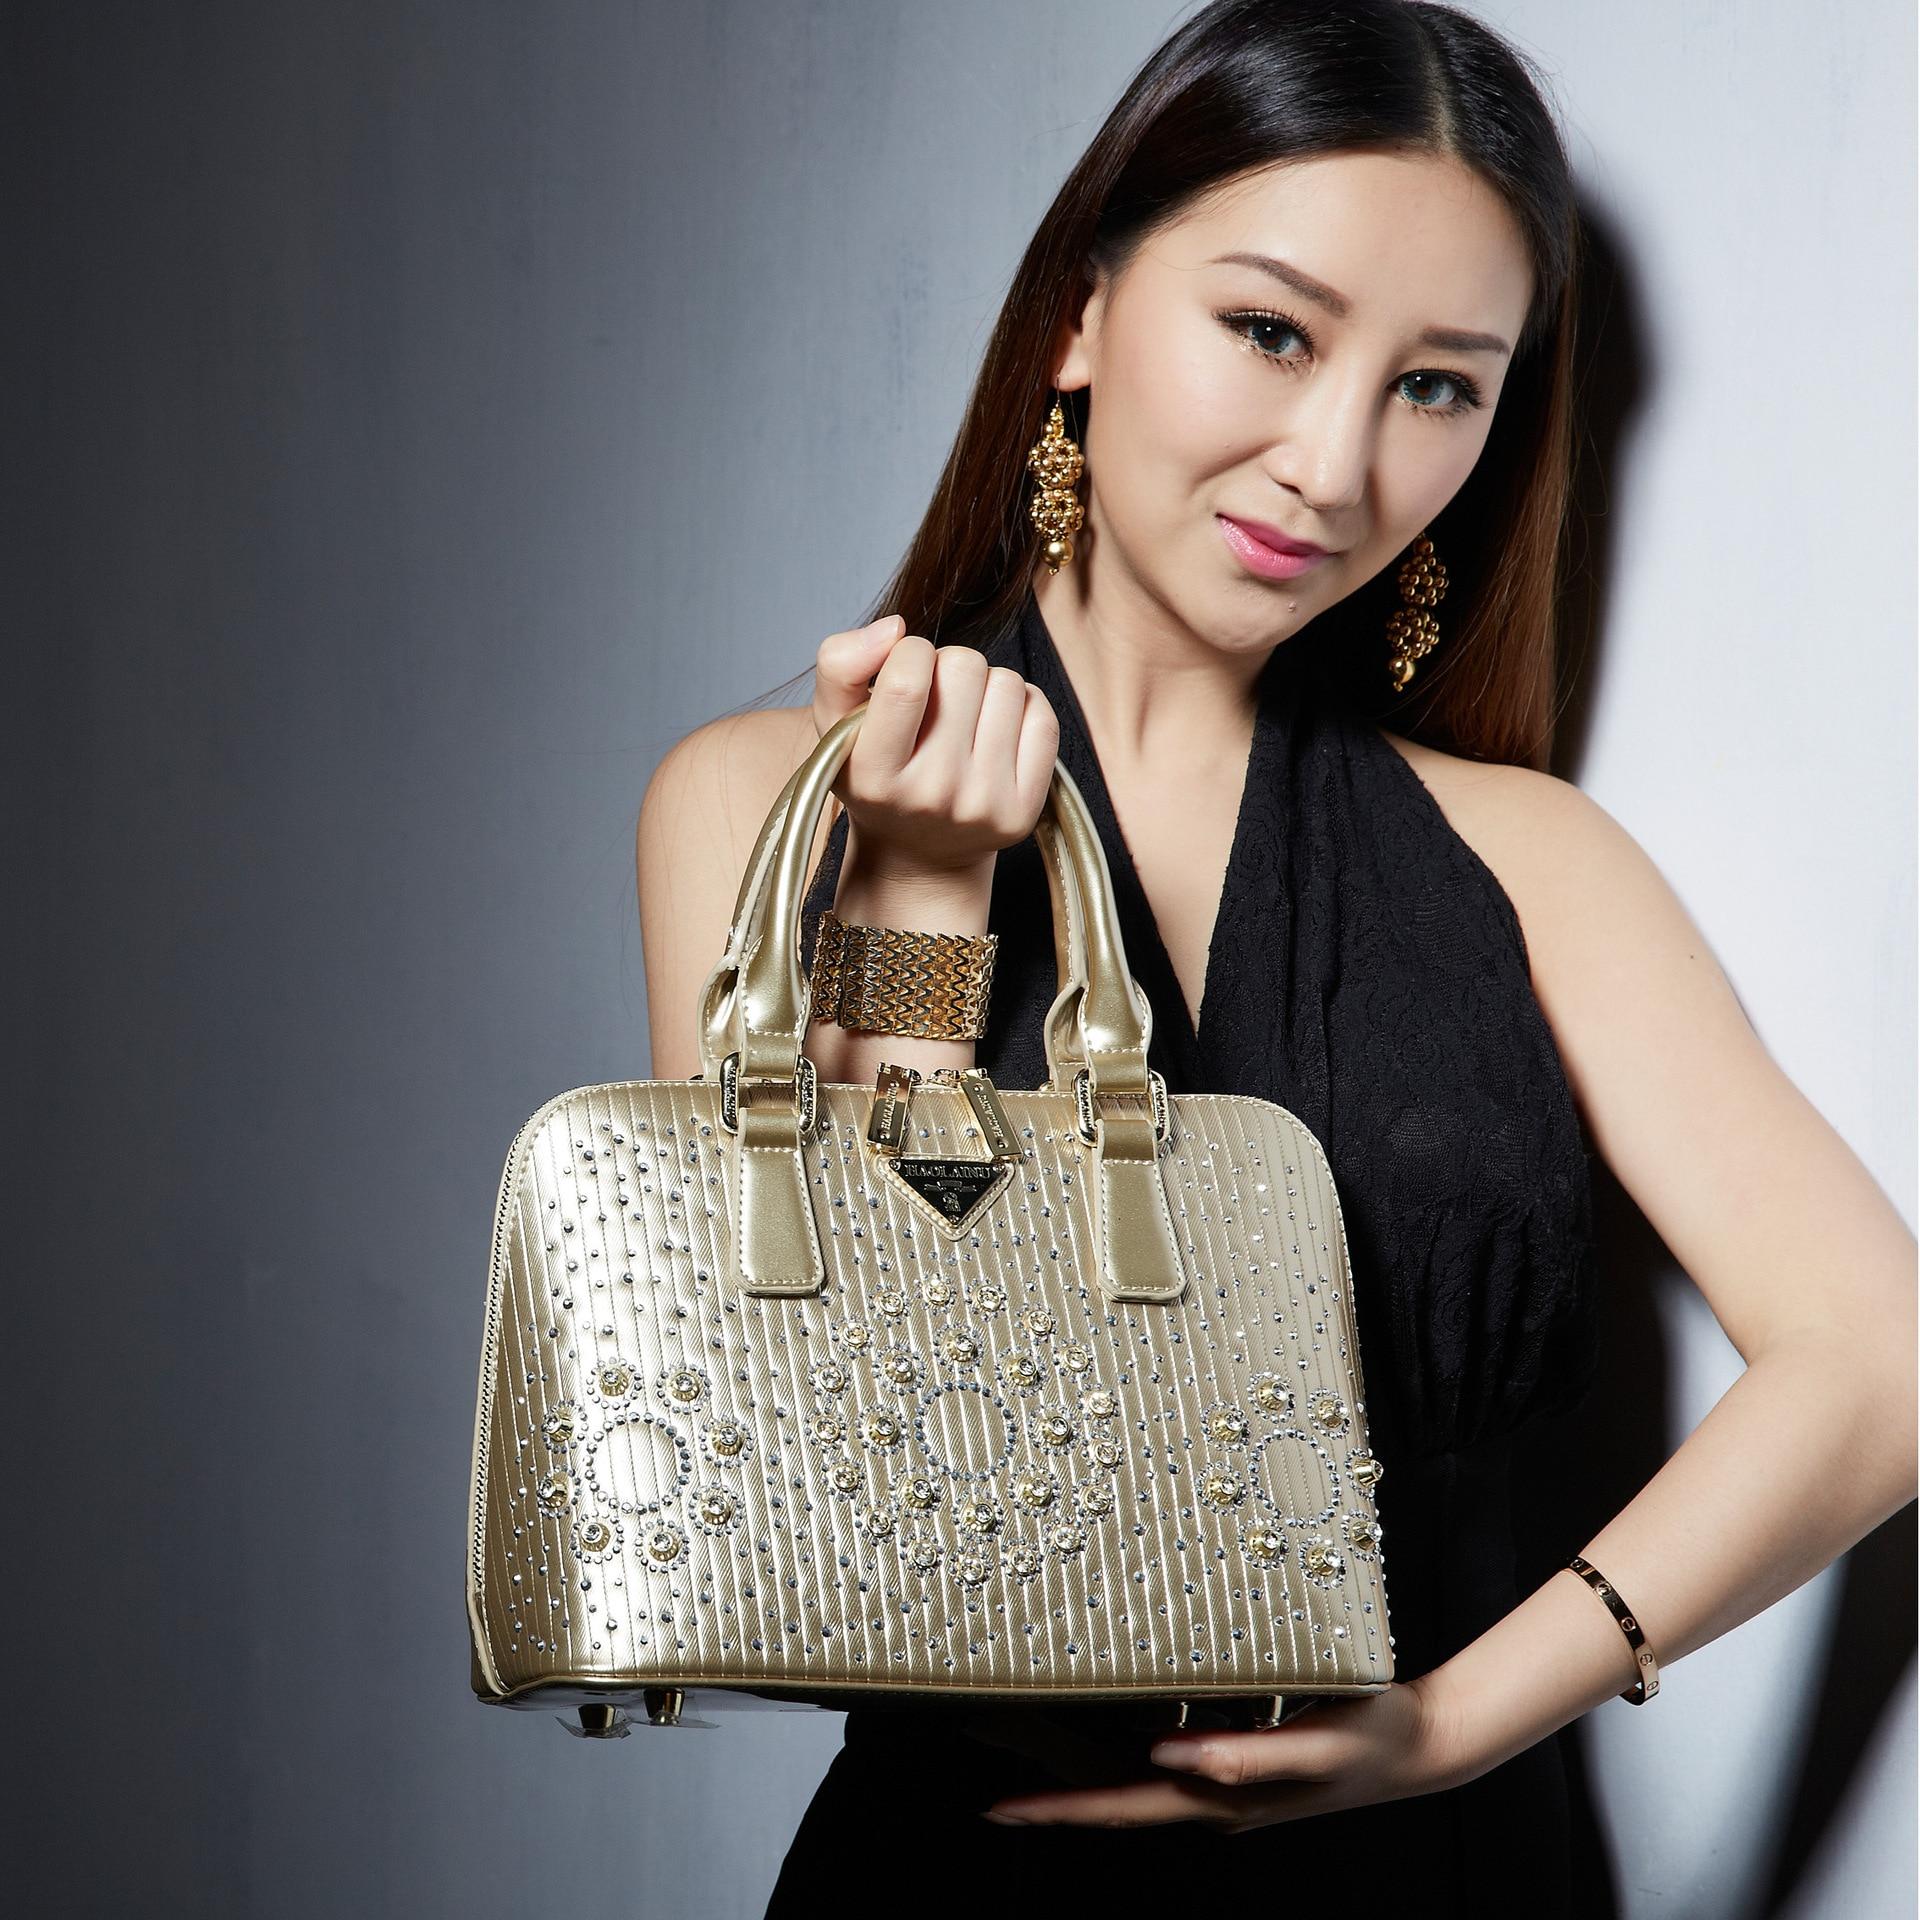 ФОТО 2017 Champagne Women's Leather Handbag Shell Bag for Party wedding with Diamond Shoulder Bag Fashion Messenger Bag brilliant